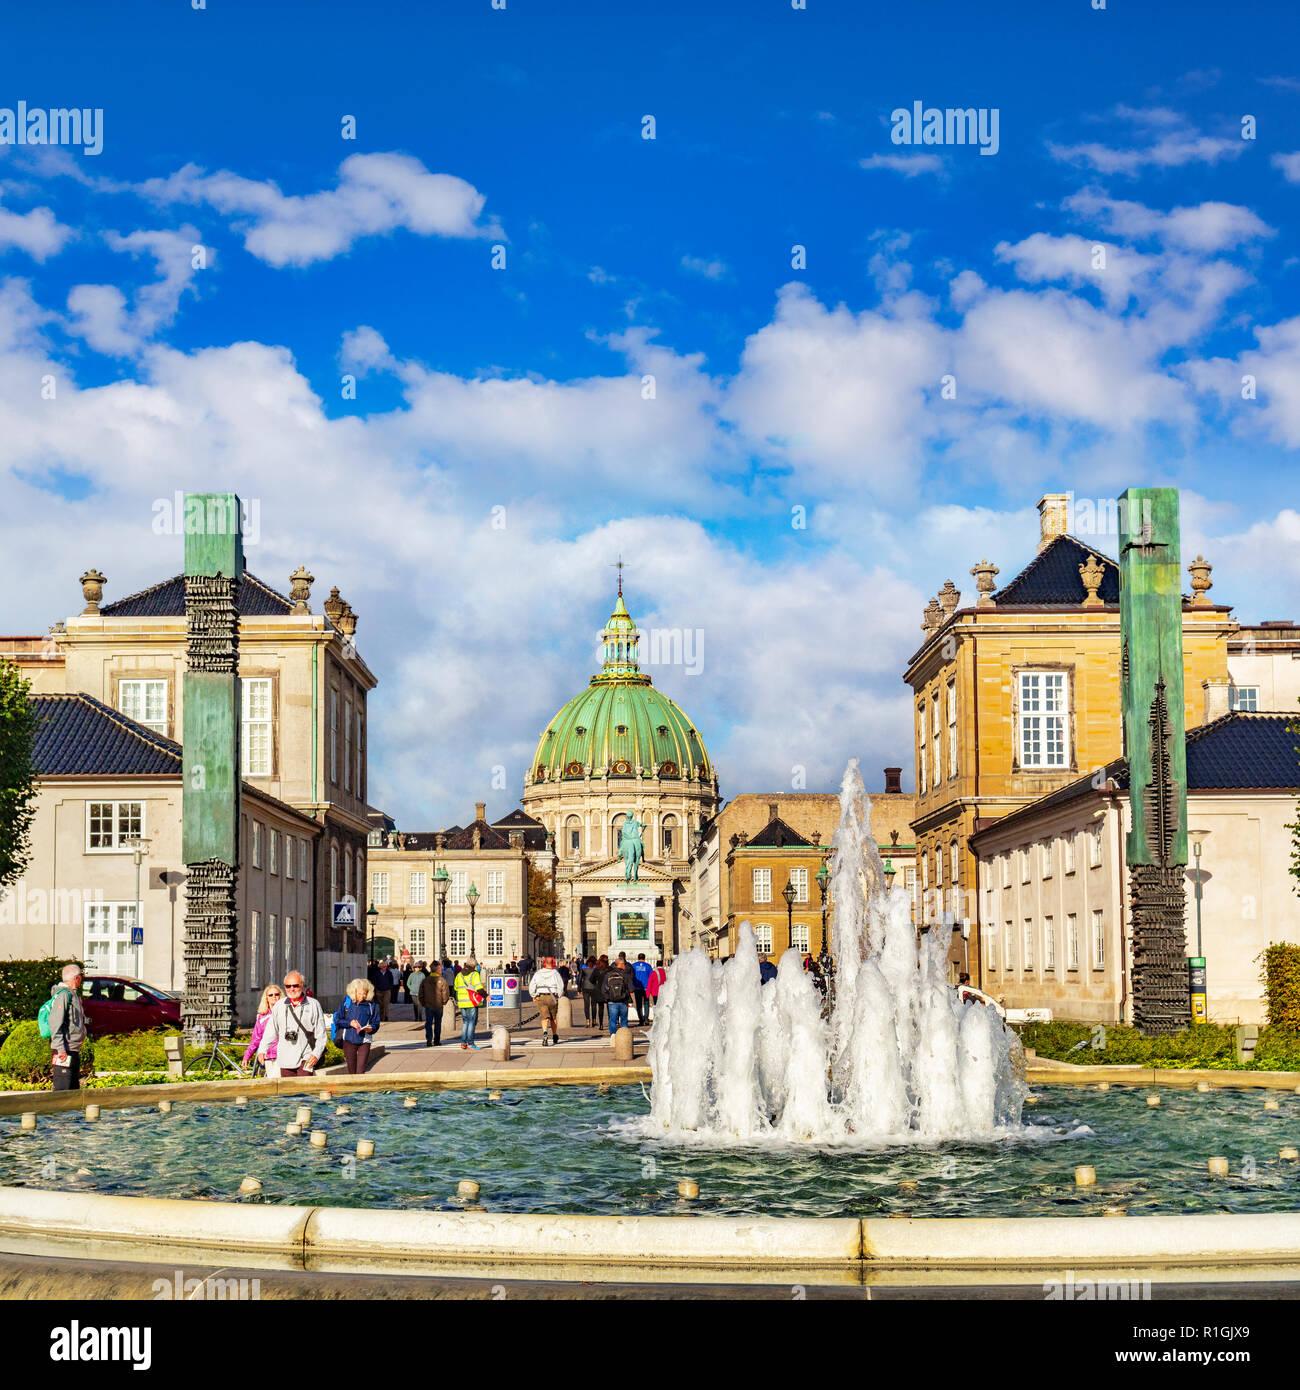 23 September 2018: Copenhagen, Denmark - The Amaliehave Fountain, and the Marble Church (Marmorkirken or Frederikskirken),  on a sunny autumn day, tou - Stock Image